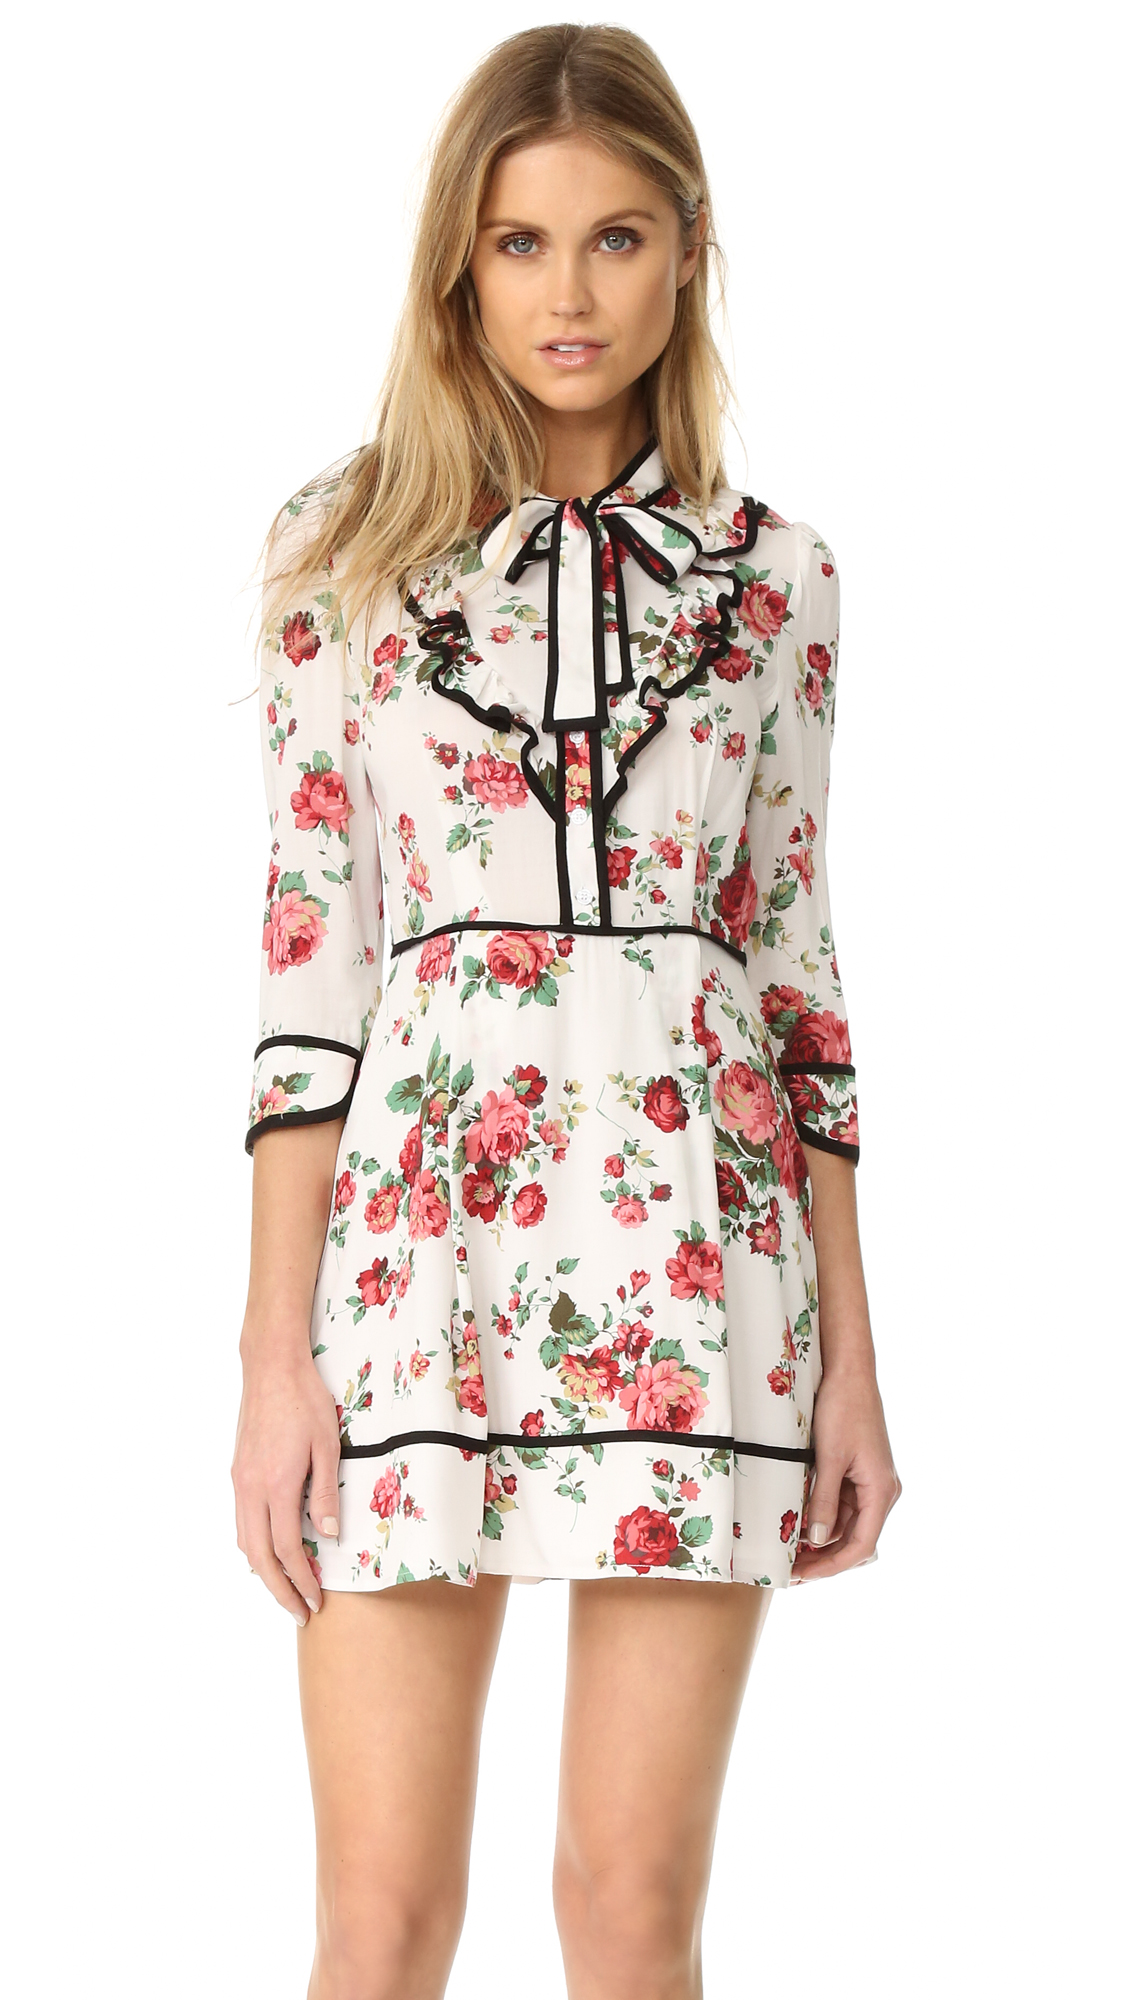 Day Dresses for Summer